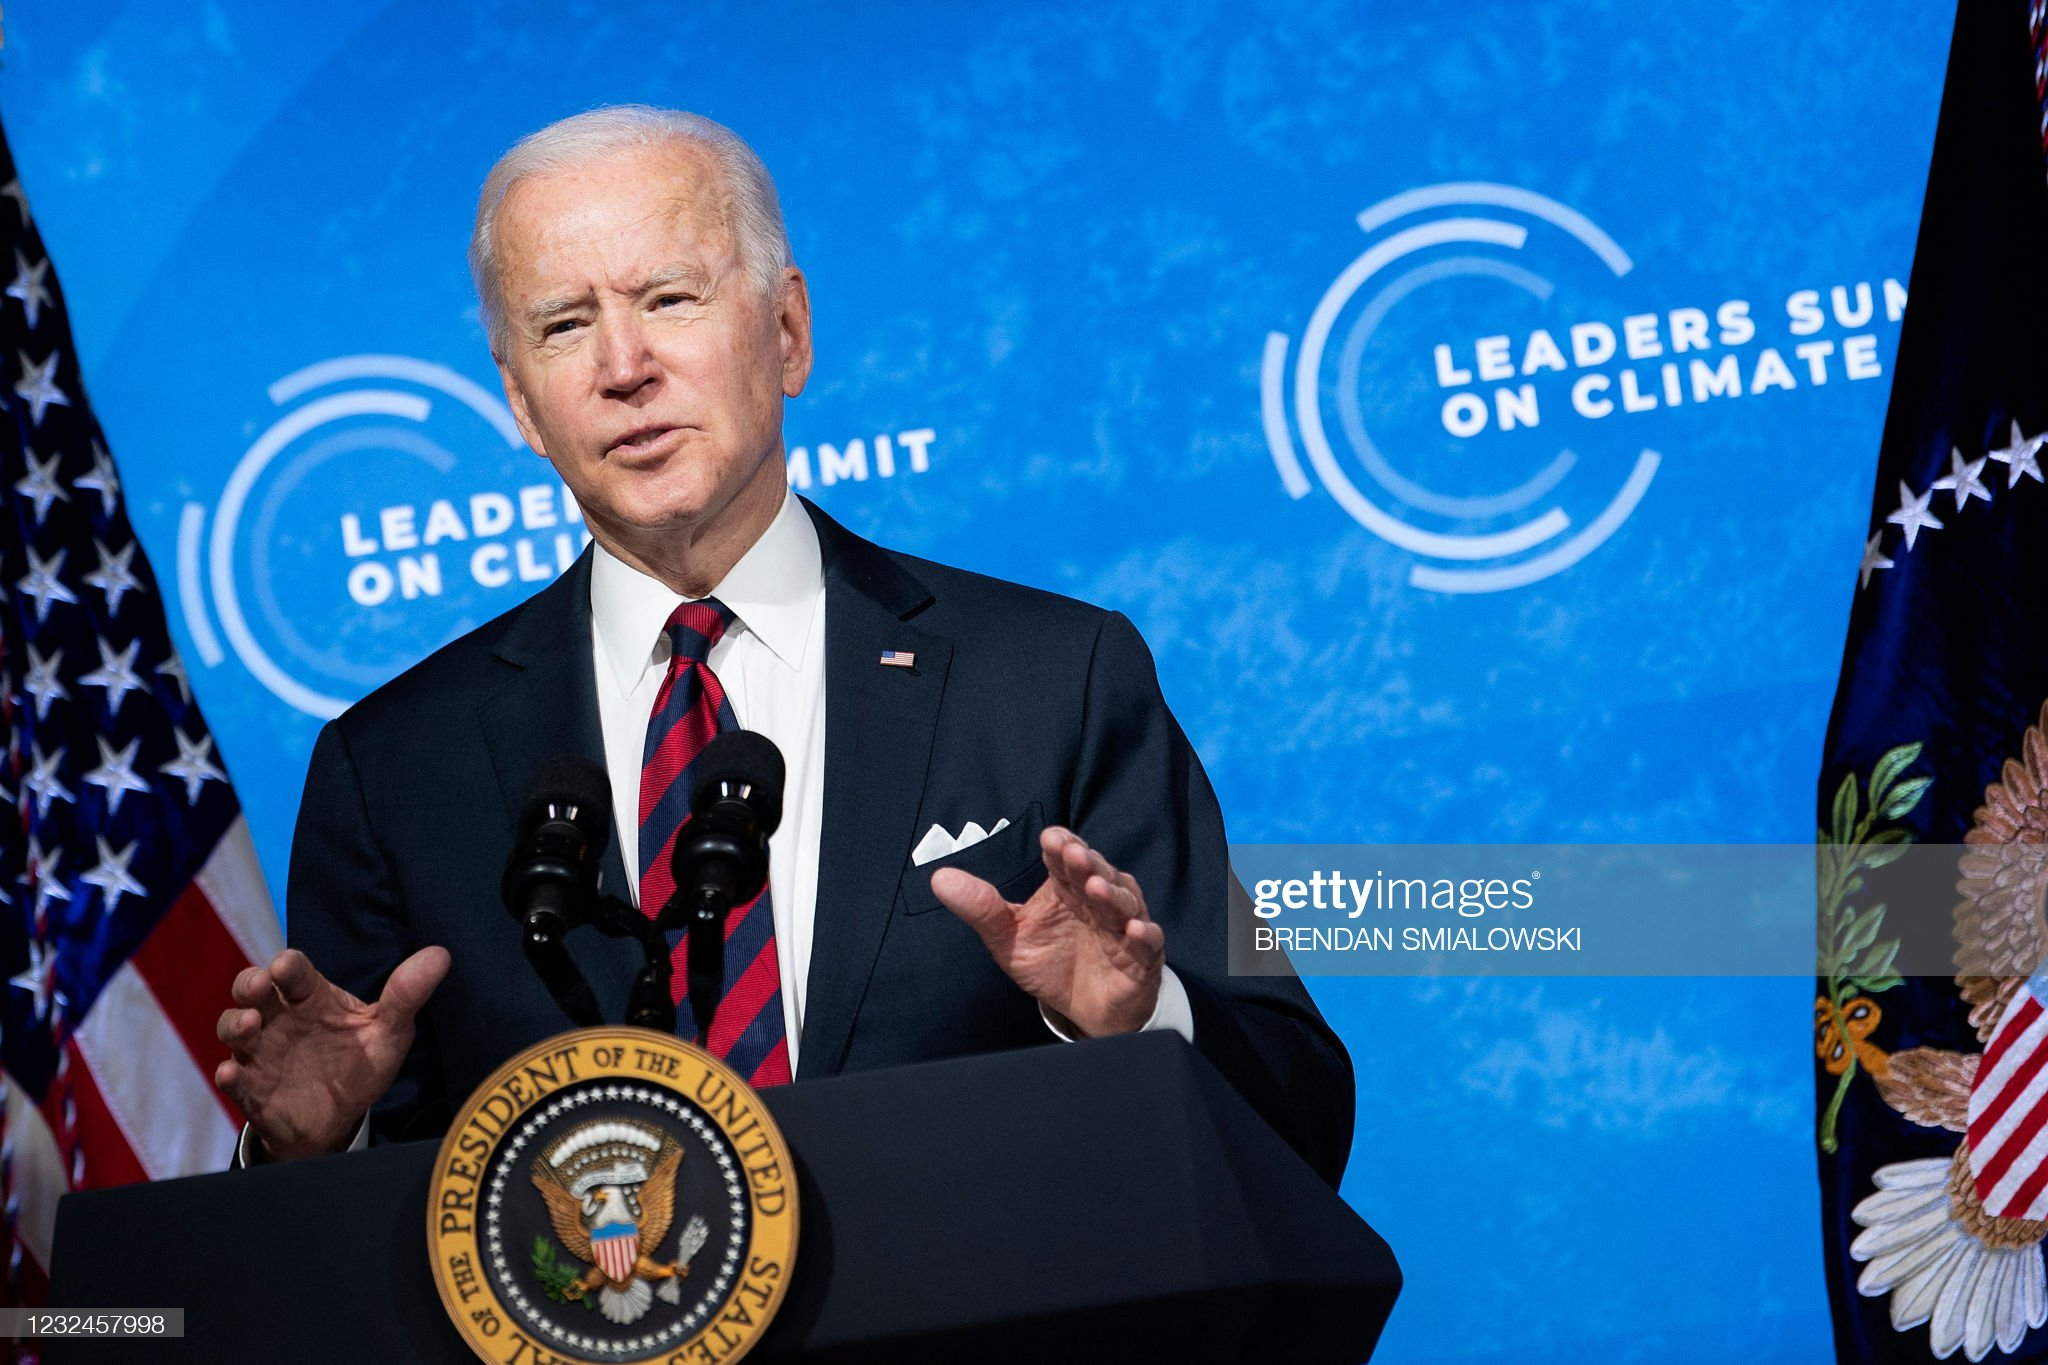 US-SUMMIT-CLIMATE-DIPLOMACY : News Photo